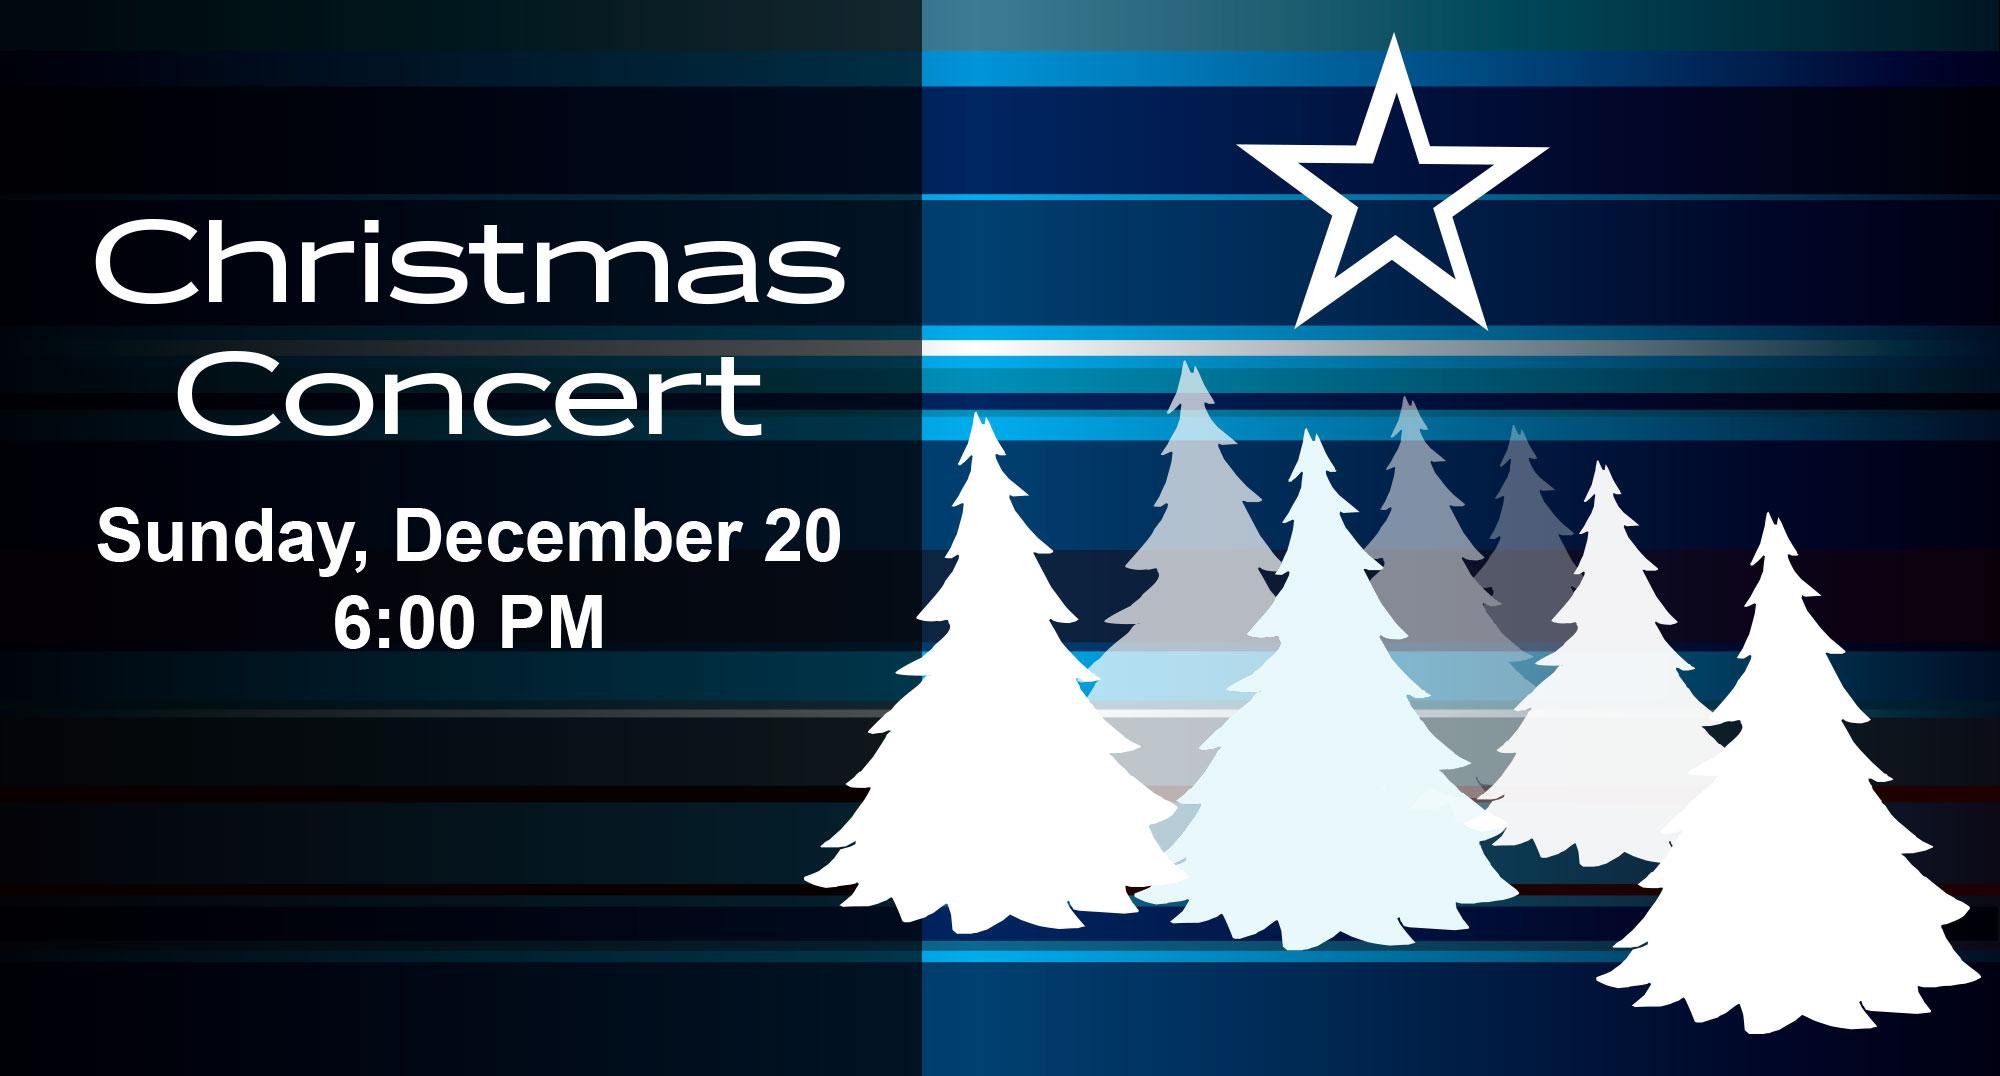 Christmas Concert Redding Connecticut